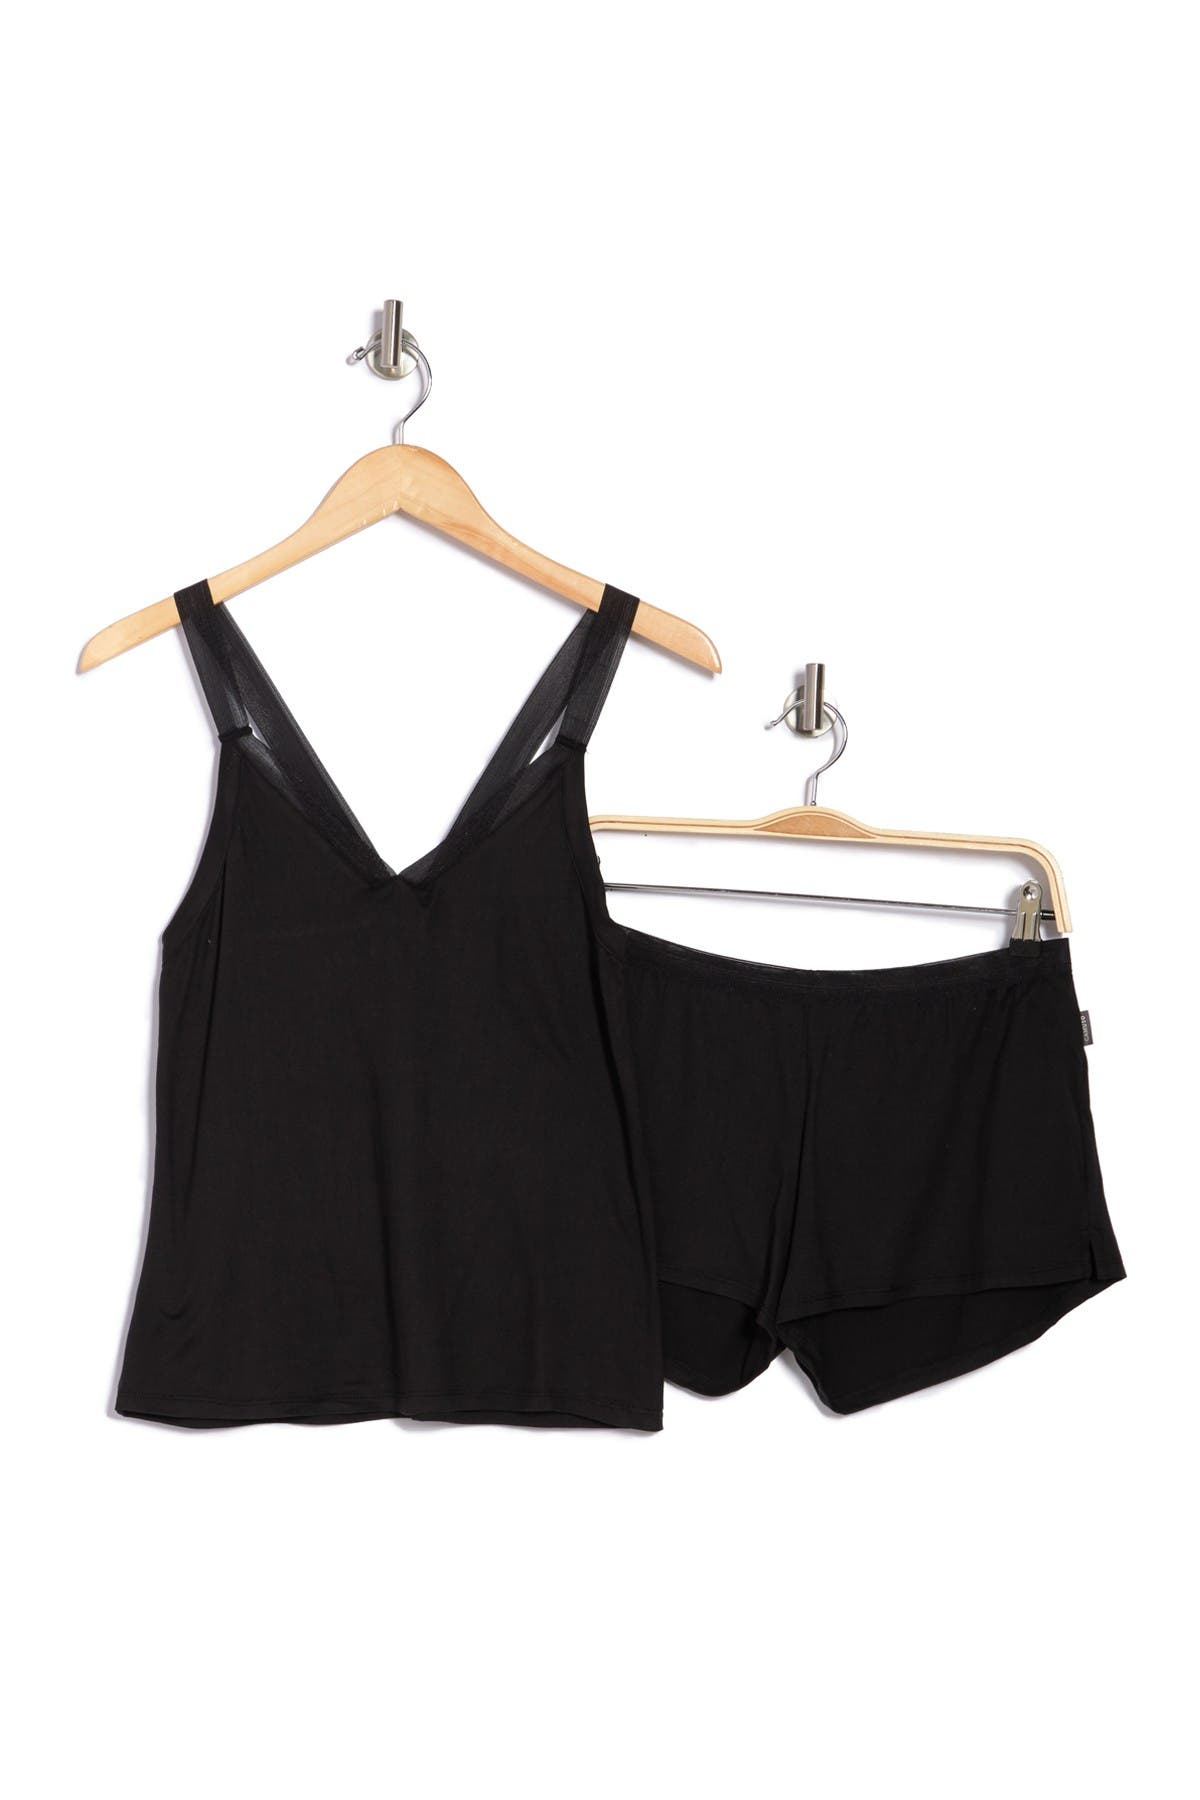 Vince Camuto Daphne Tank & Shorts Pajama 2-Piece Set